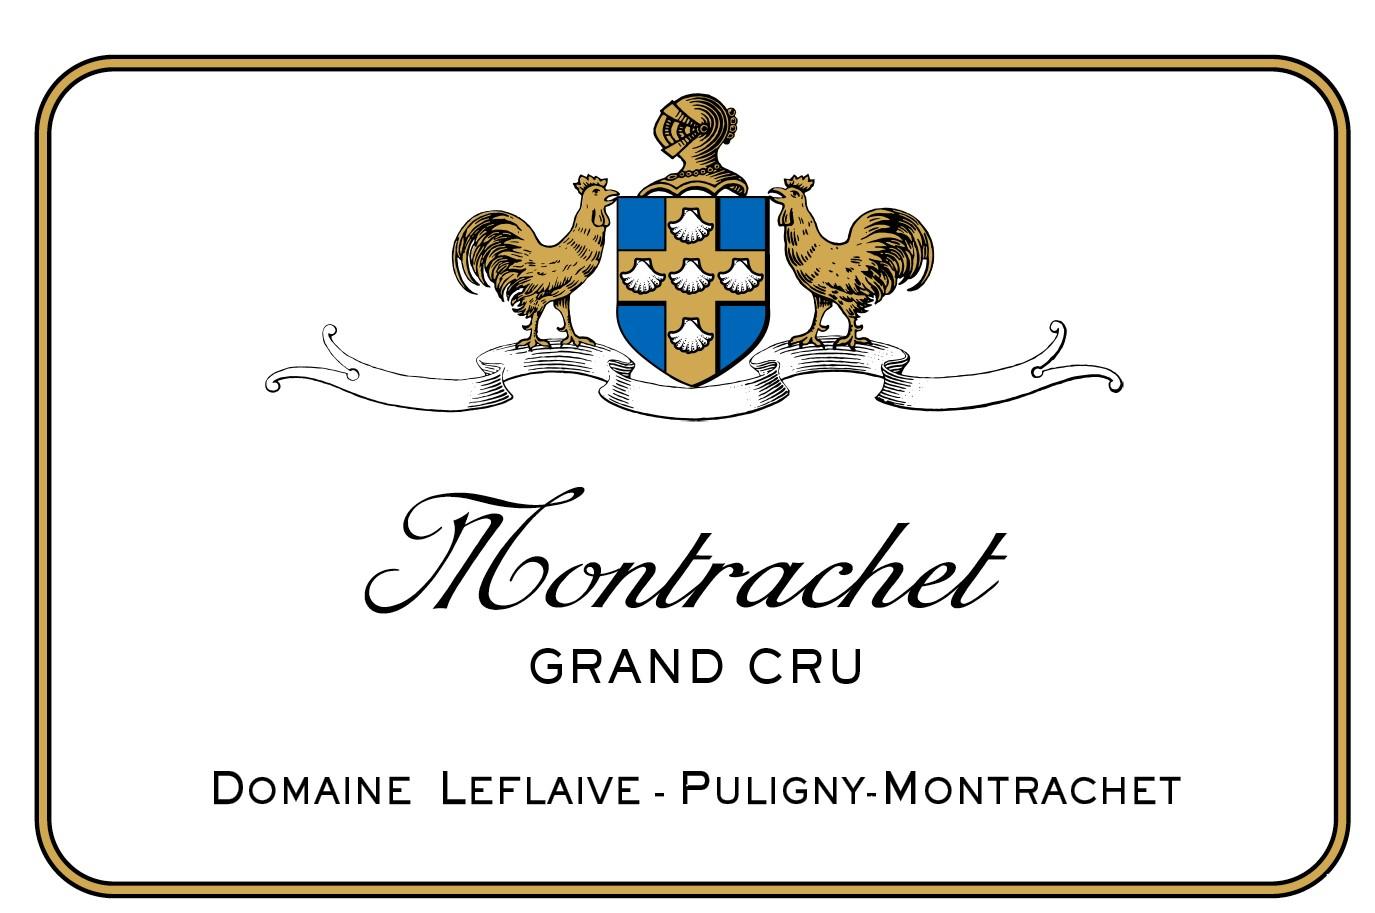 Domaine Leflaive Montrachet Grand Cru Logo Design